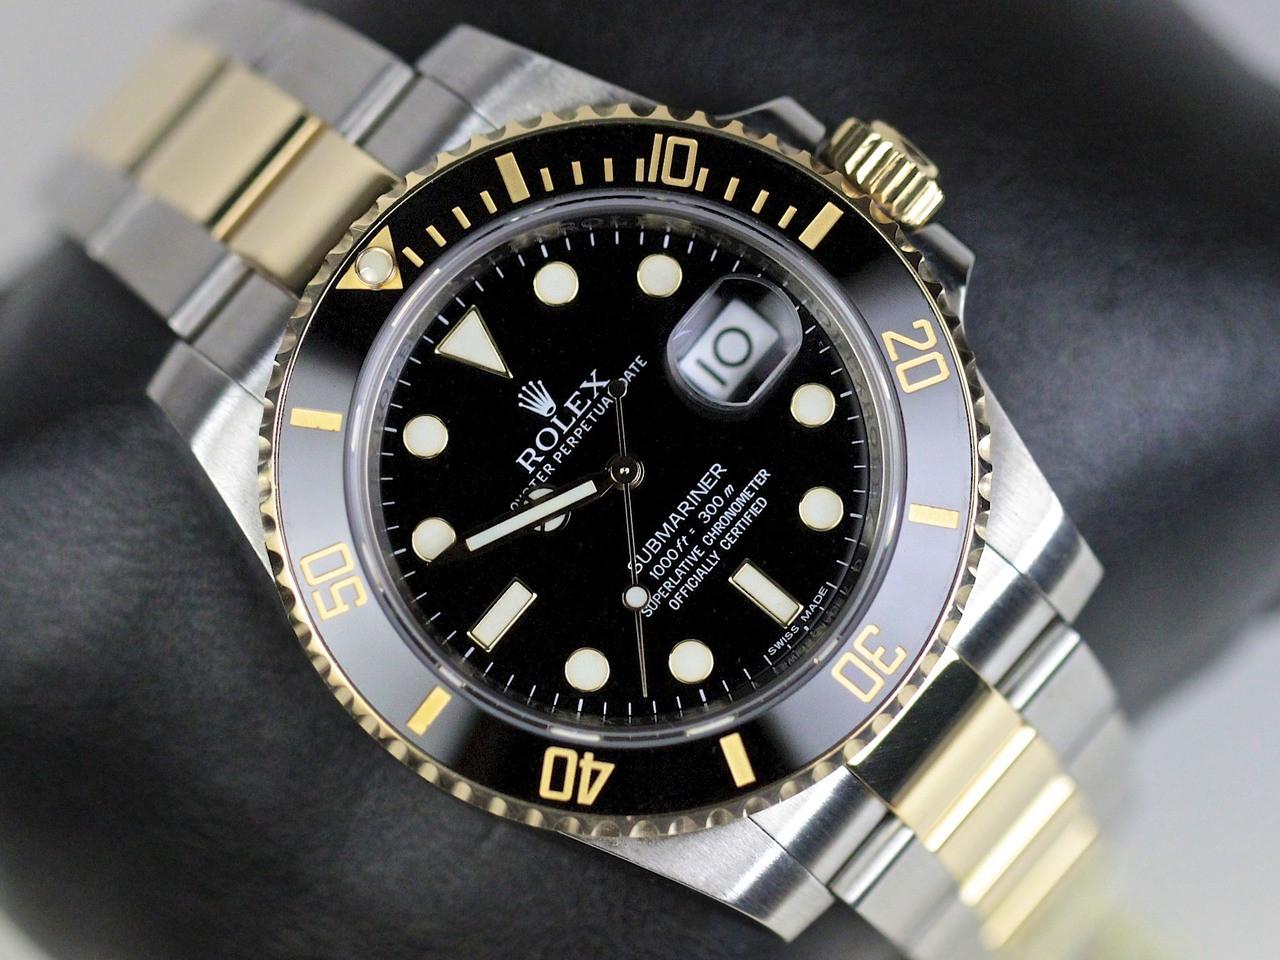 Dial & Bezel Detail - Rolex Watch Submariner Steel and Gold 116613 - www. Legendoftime.com - Chicago Watch Center